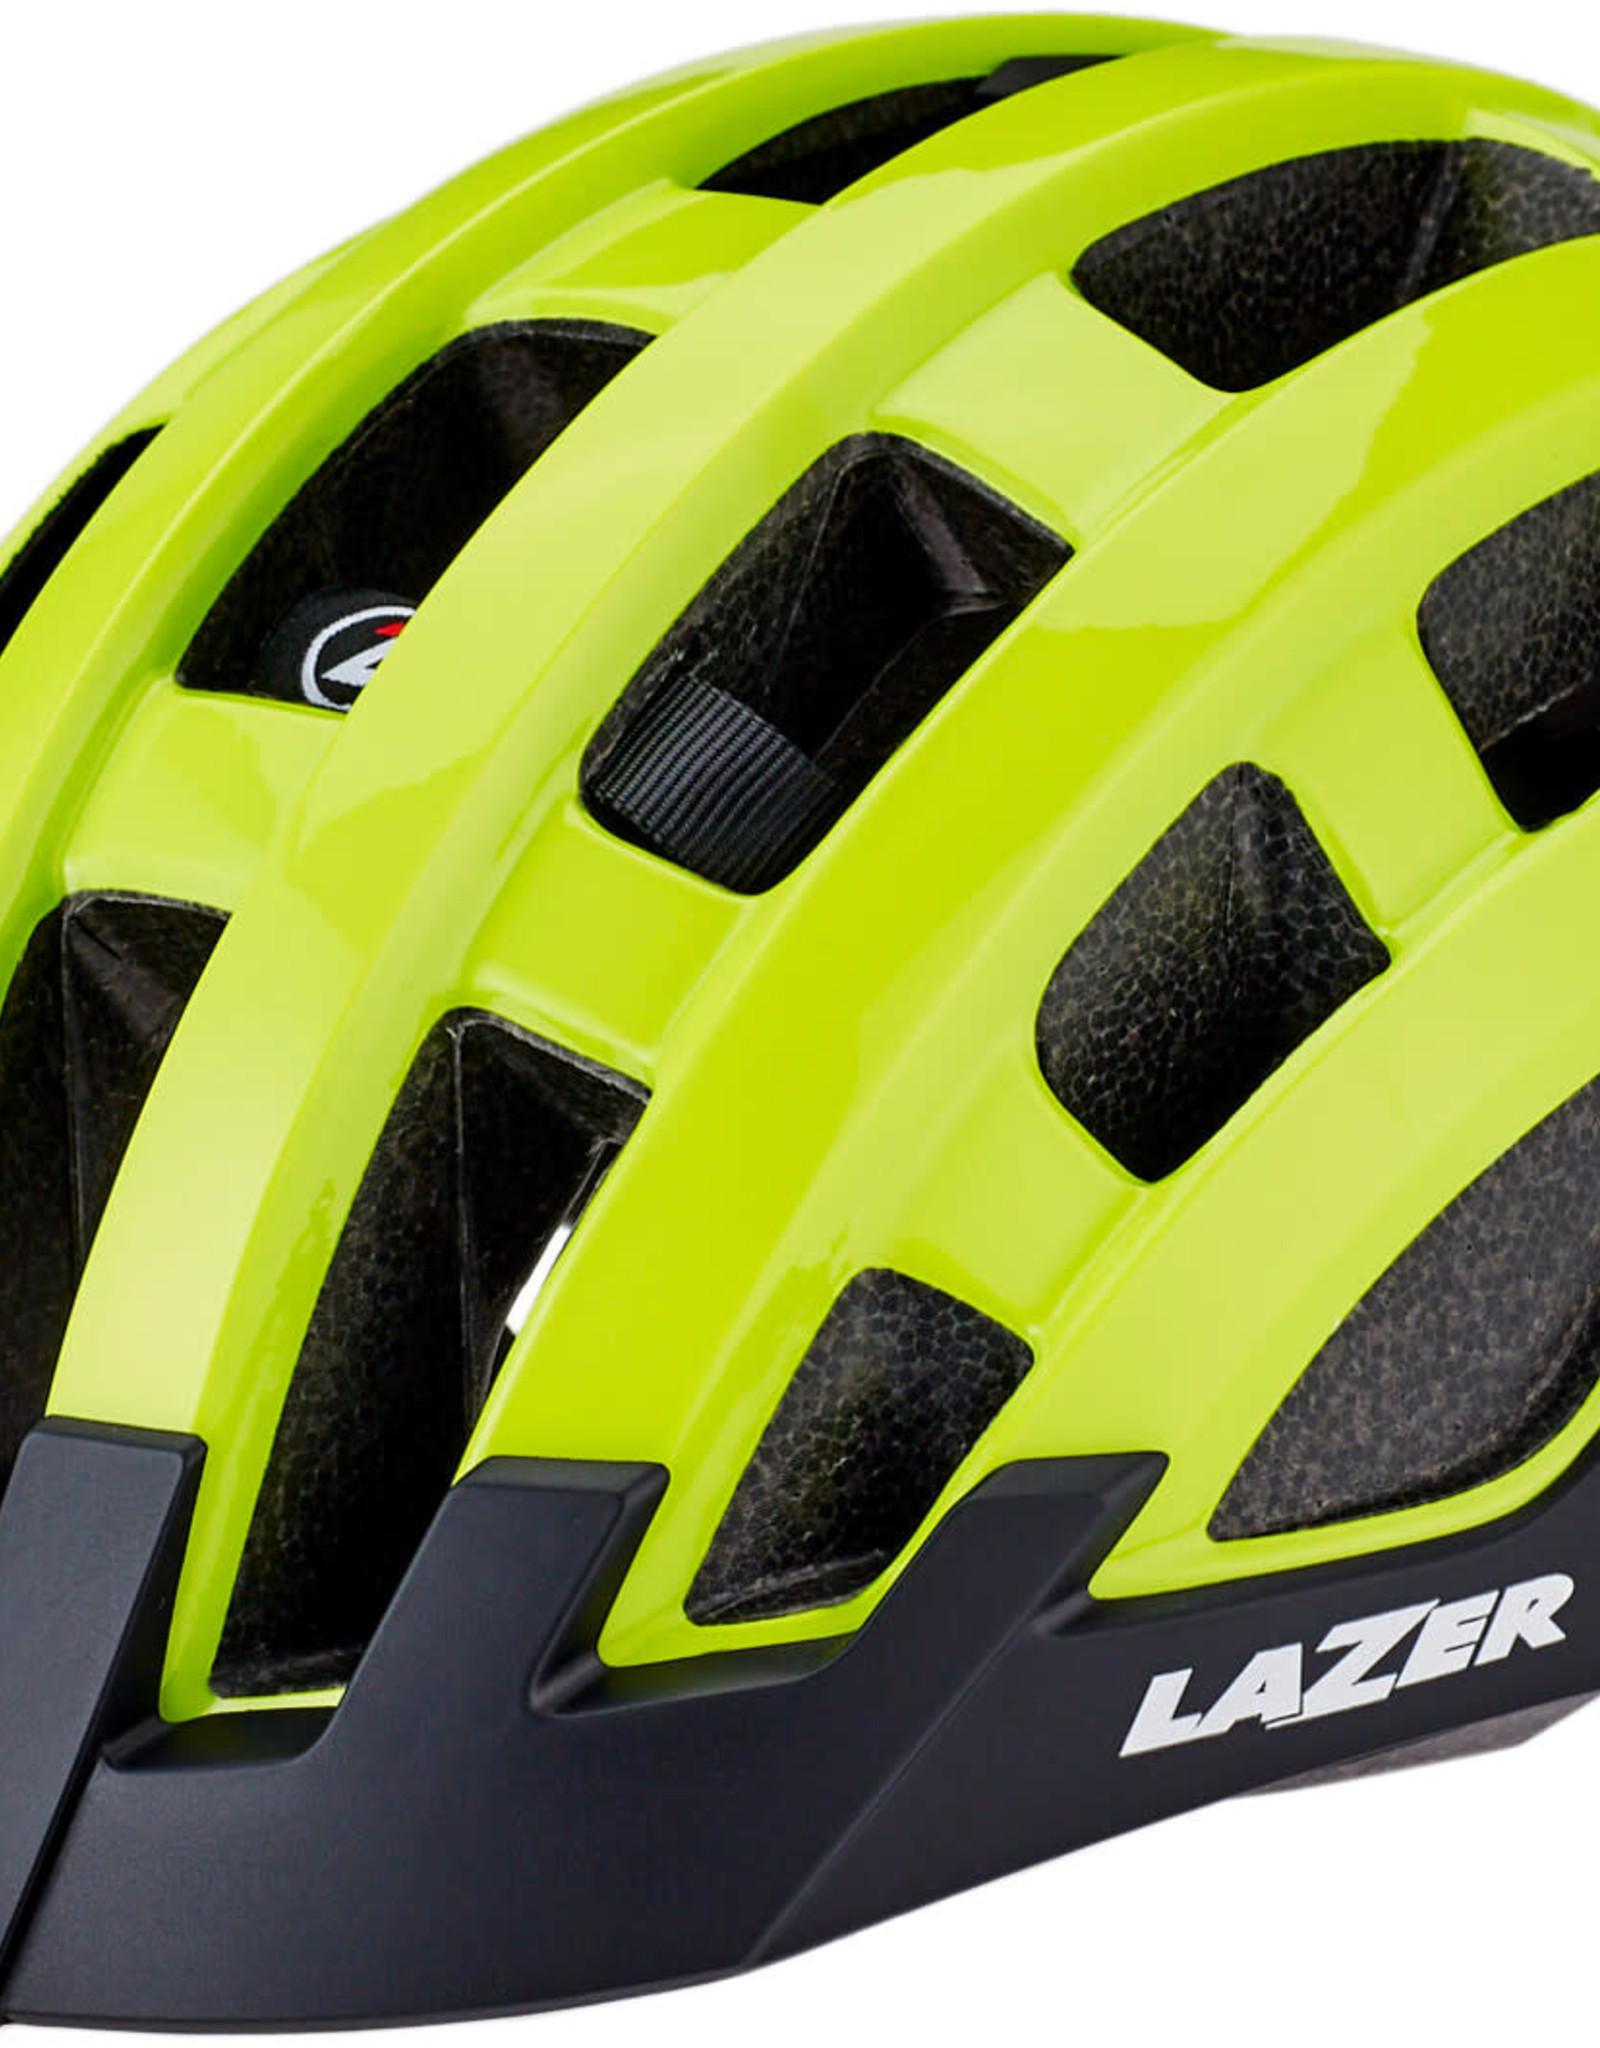 Lazer Lazer Compact